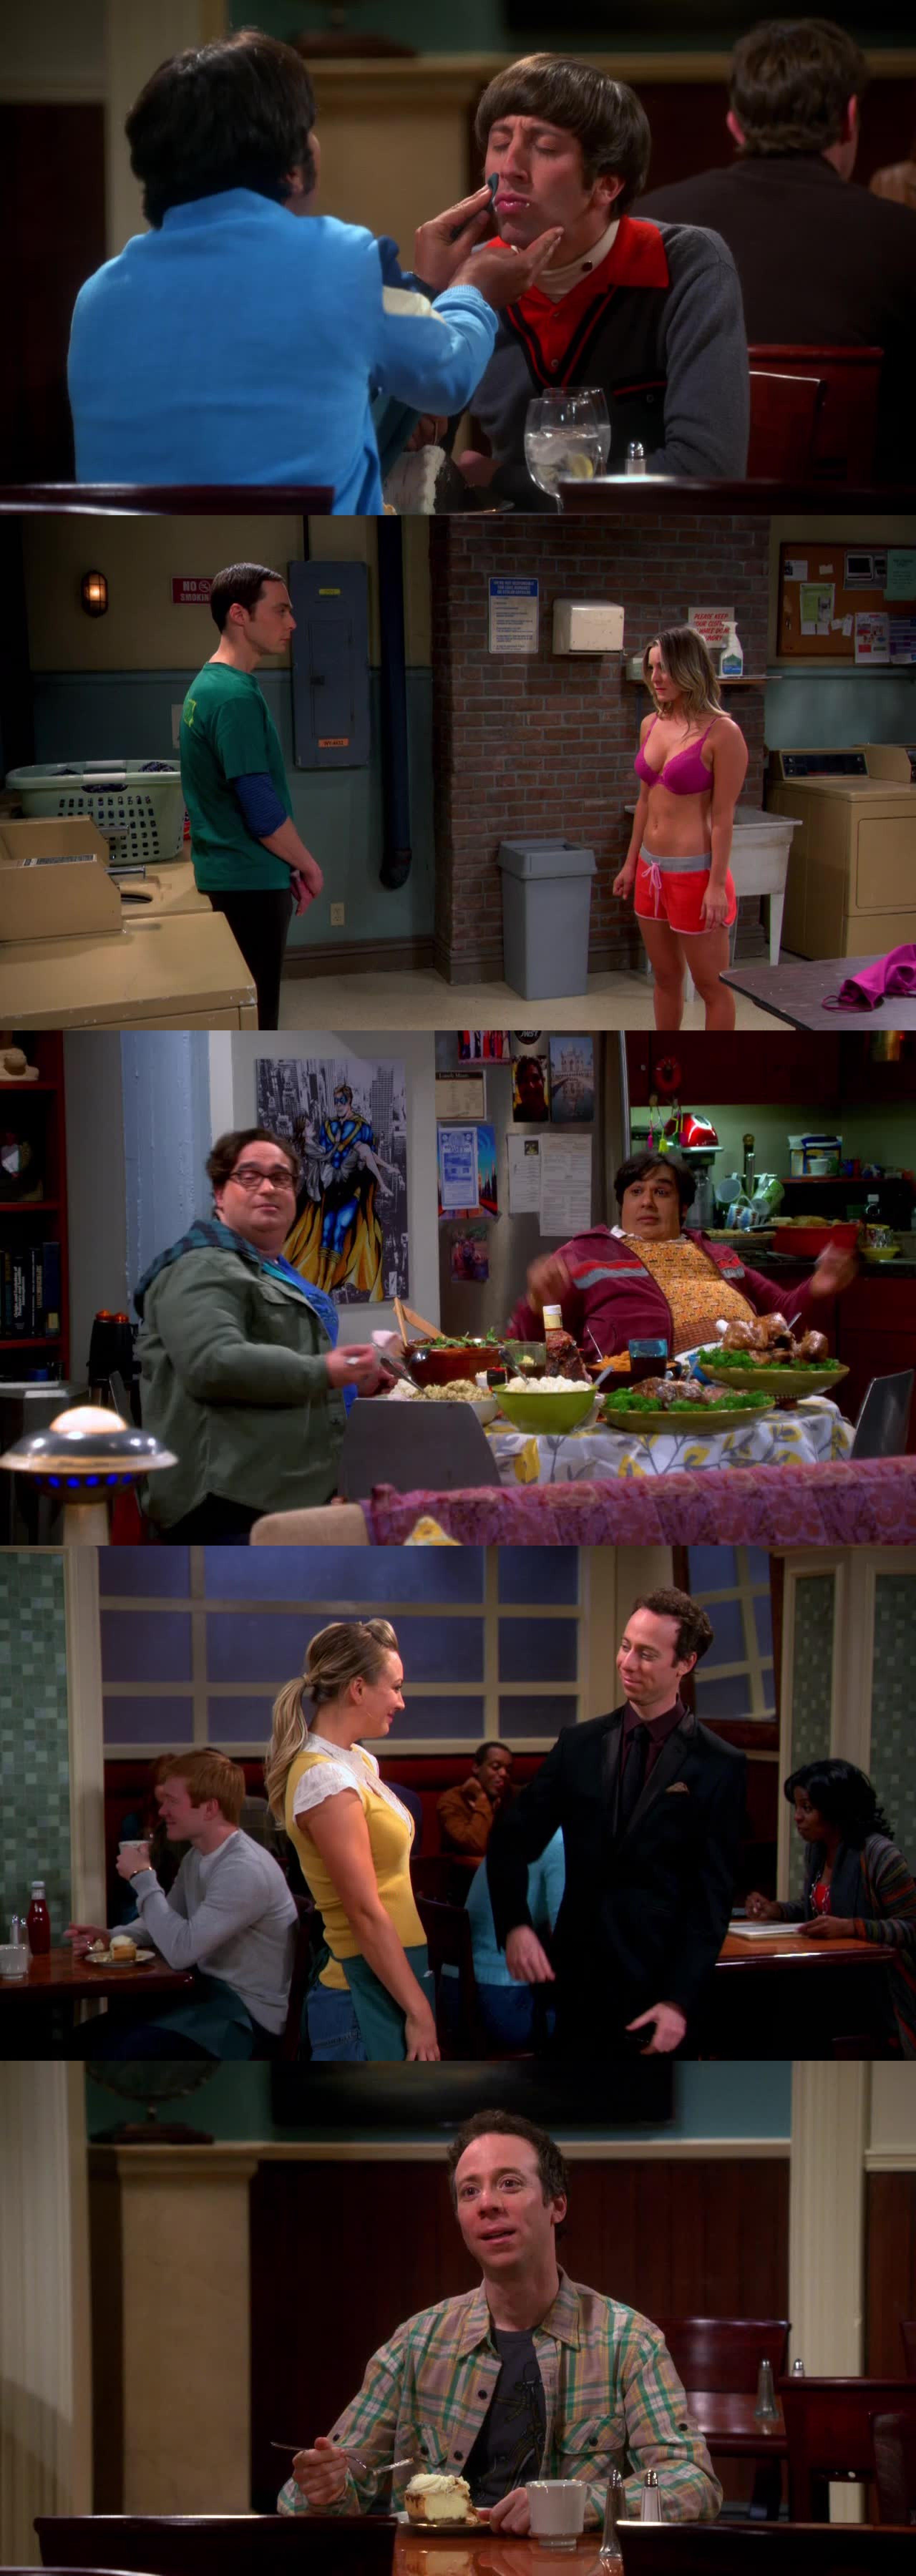 Hilarious ! So many scene !! Really good episode !!